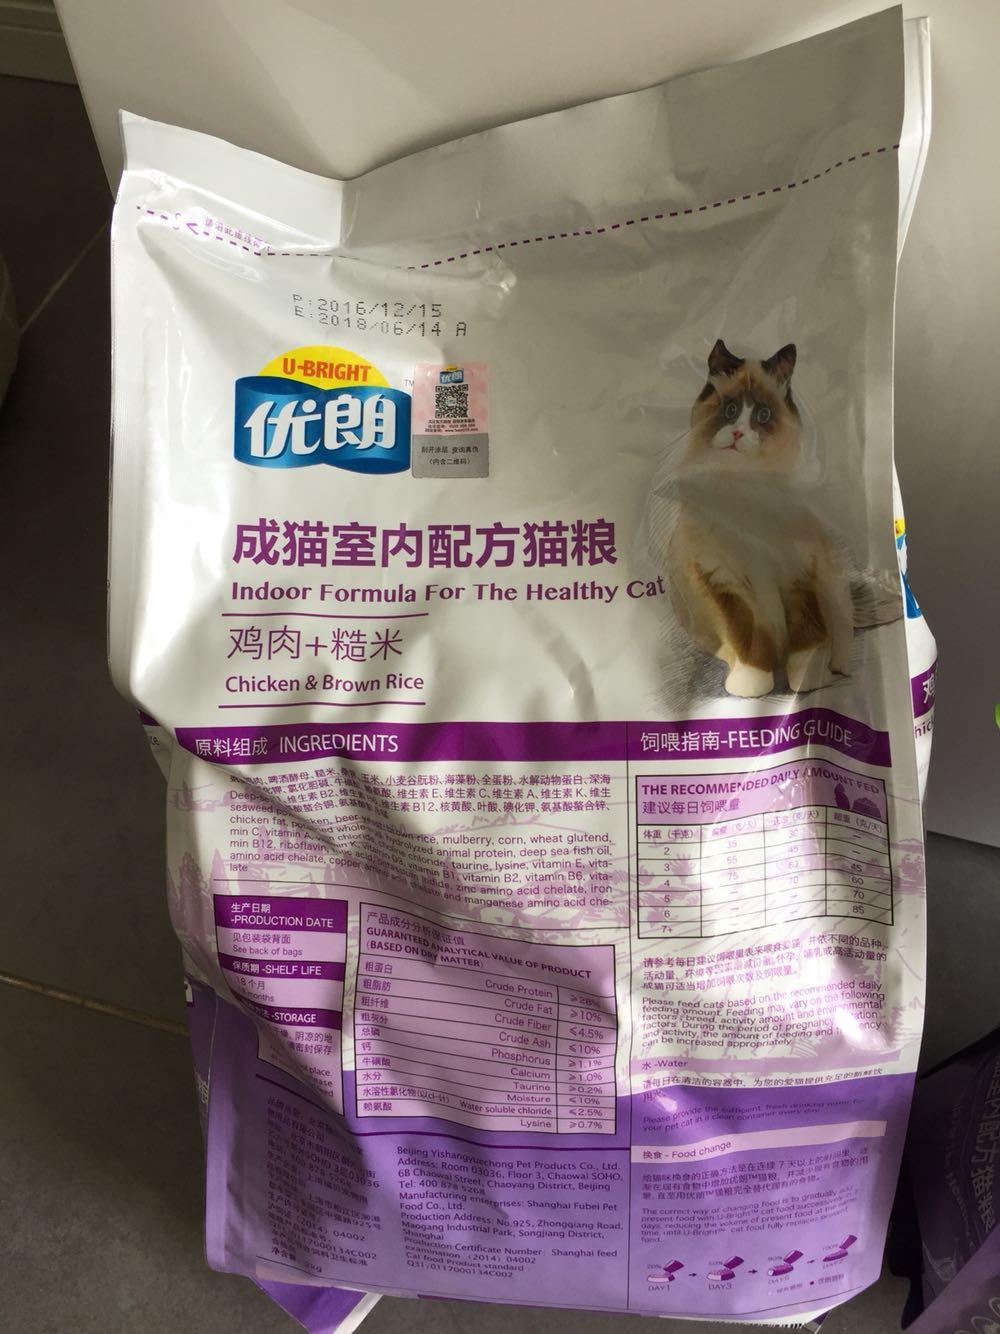 air max pink black grey 00998711 wholesale